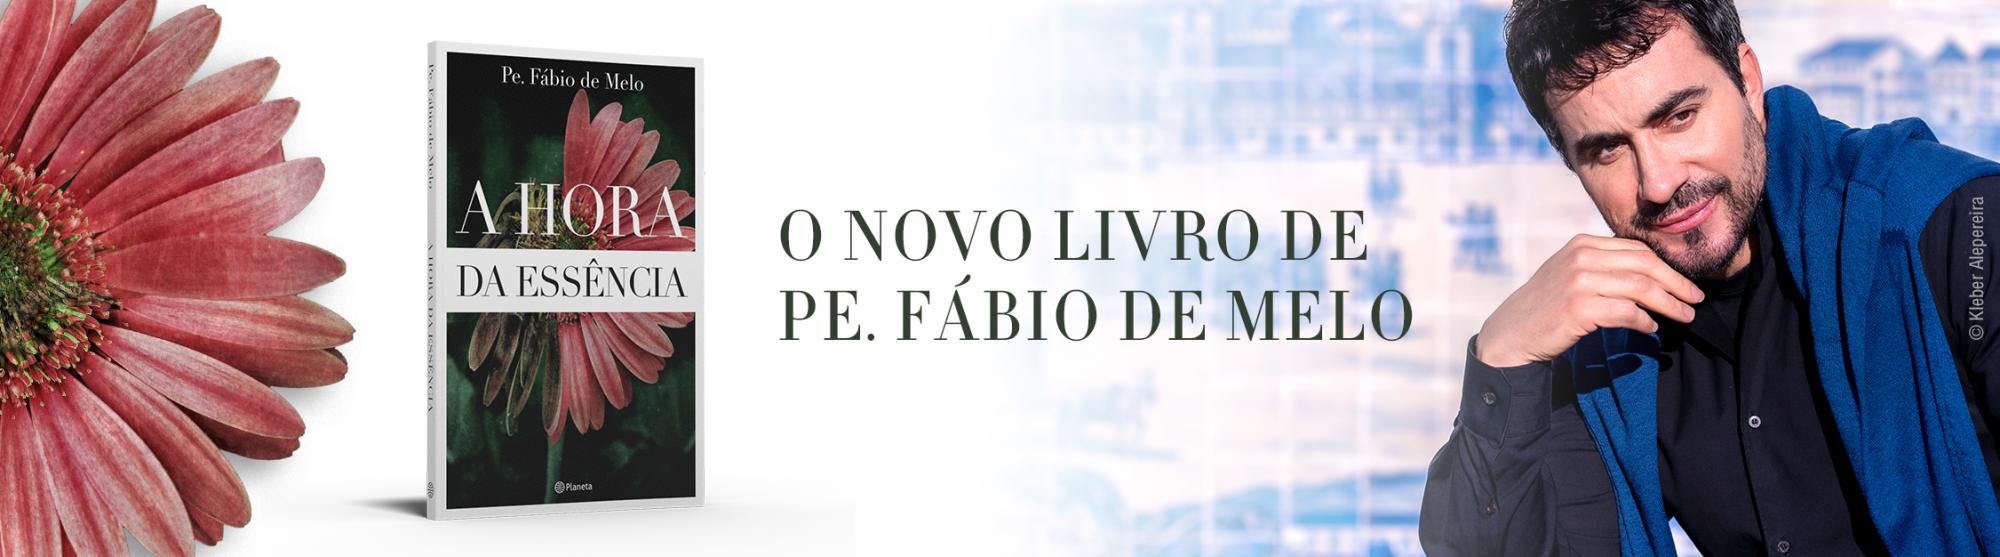 263_1_A_hora_da_essencia.png